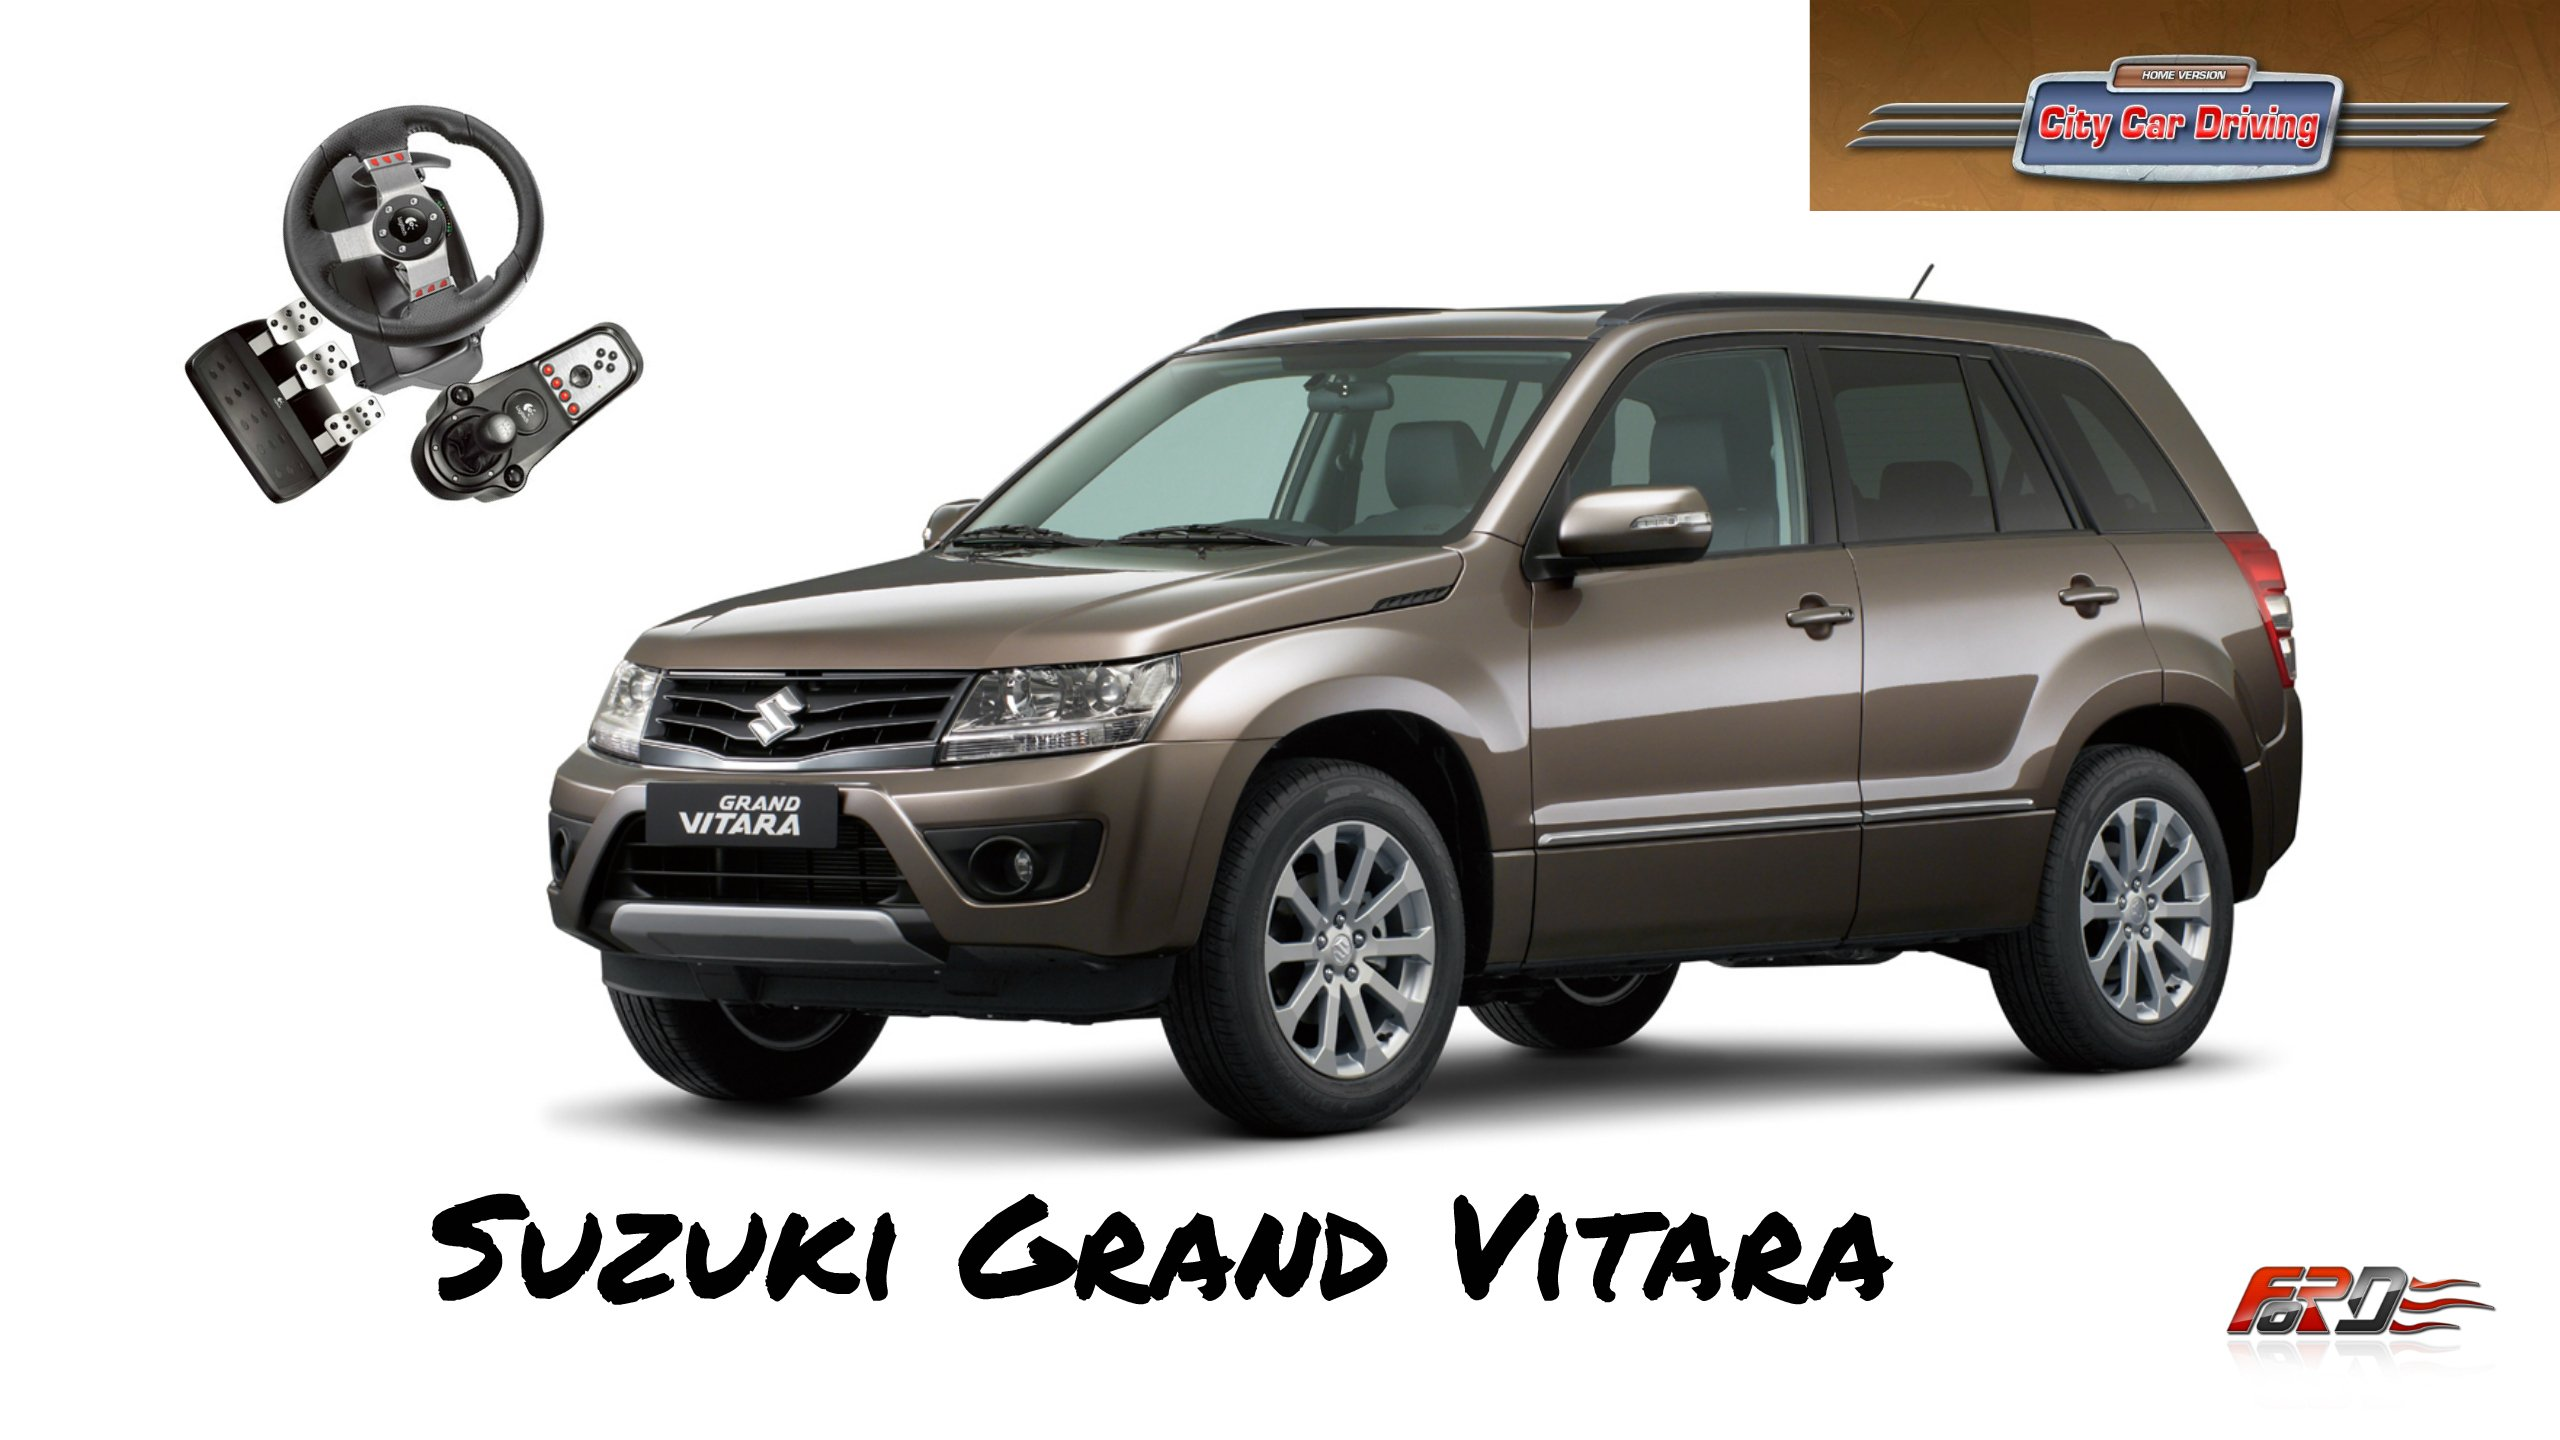 Suzuki Grand Vitara - тест-драйв, обзор японского паркетника на бездорожье в City Car Driving 1.5. - Изображение 1